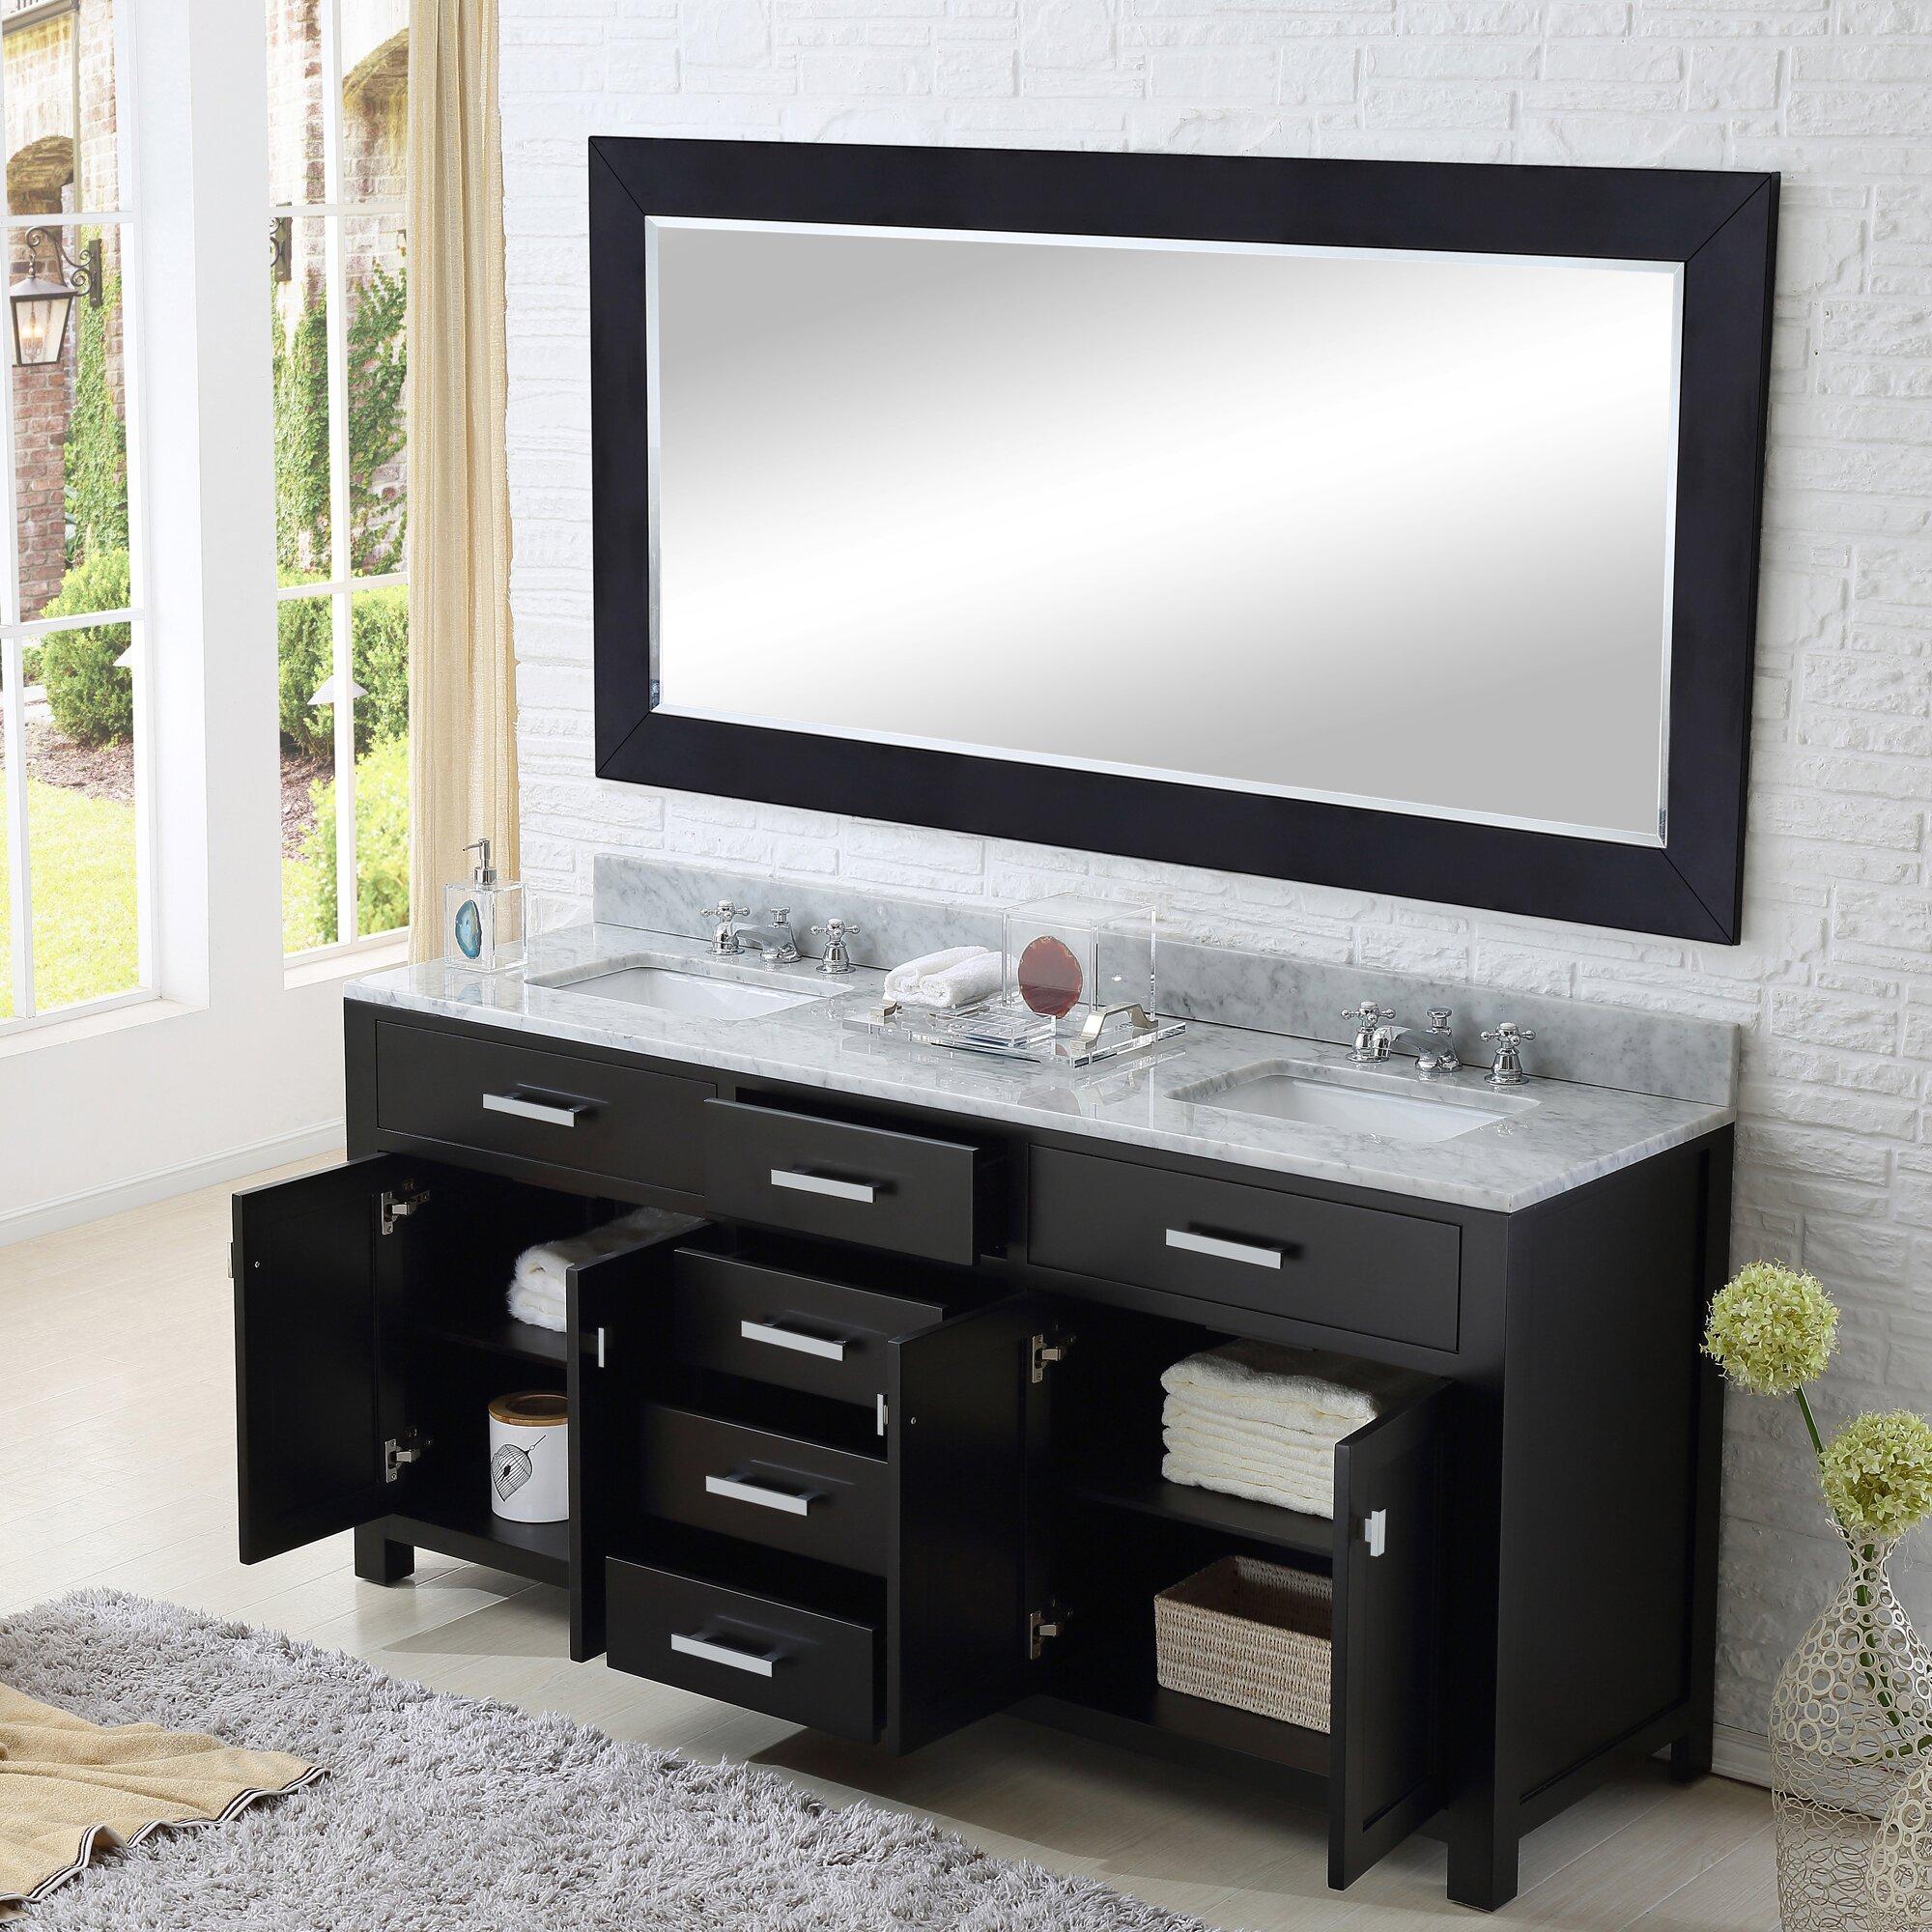 dCOR design Creighton 60 Double Bathroom Vanity Set with Large – Bathroom Vanity and Mirror Set